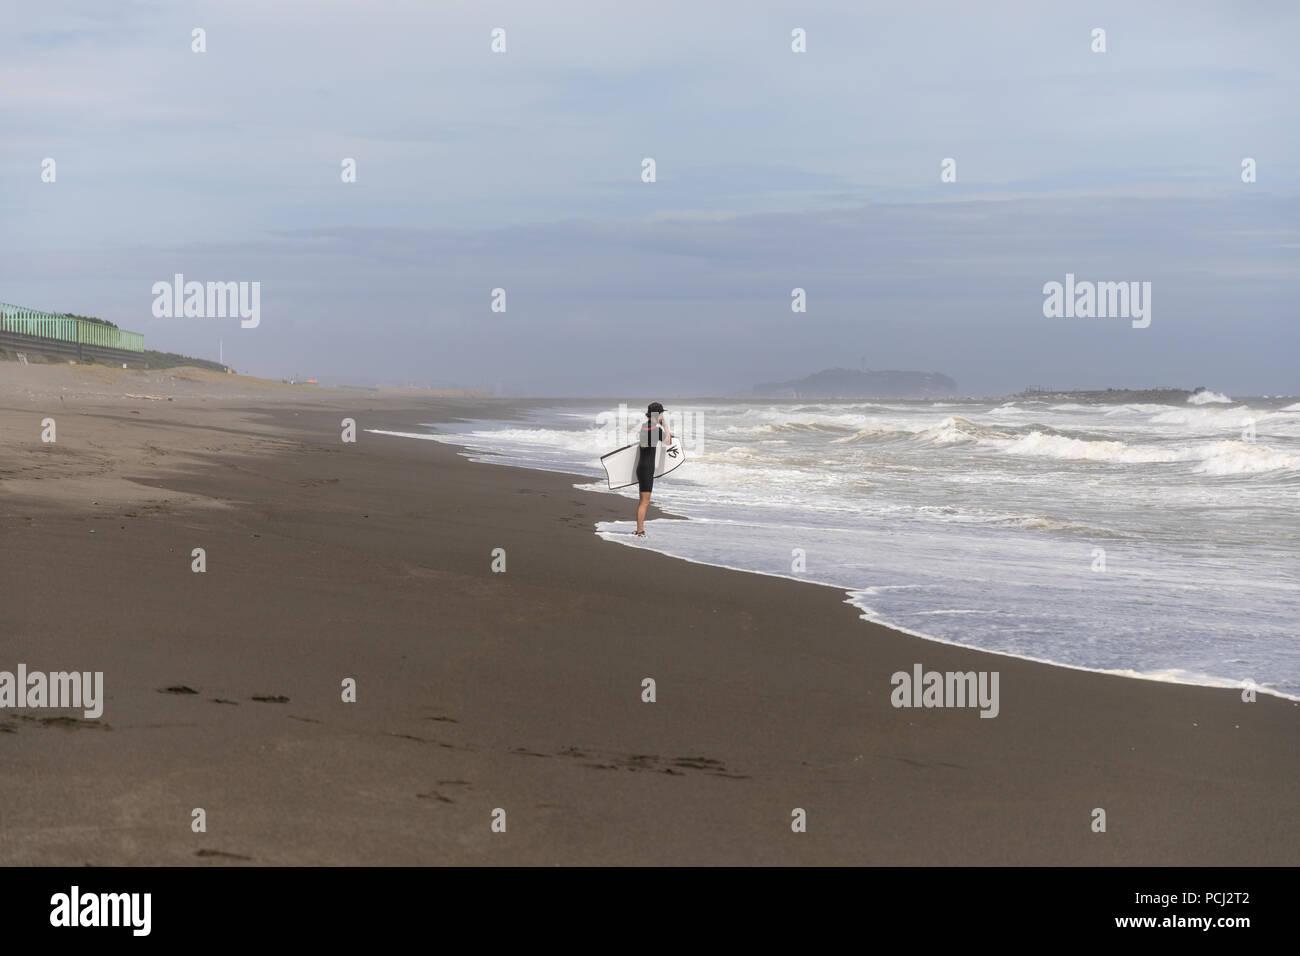 Surfer on the beach; Chigasaki, Kanagawa Prefecture, Japan - Stock Image